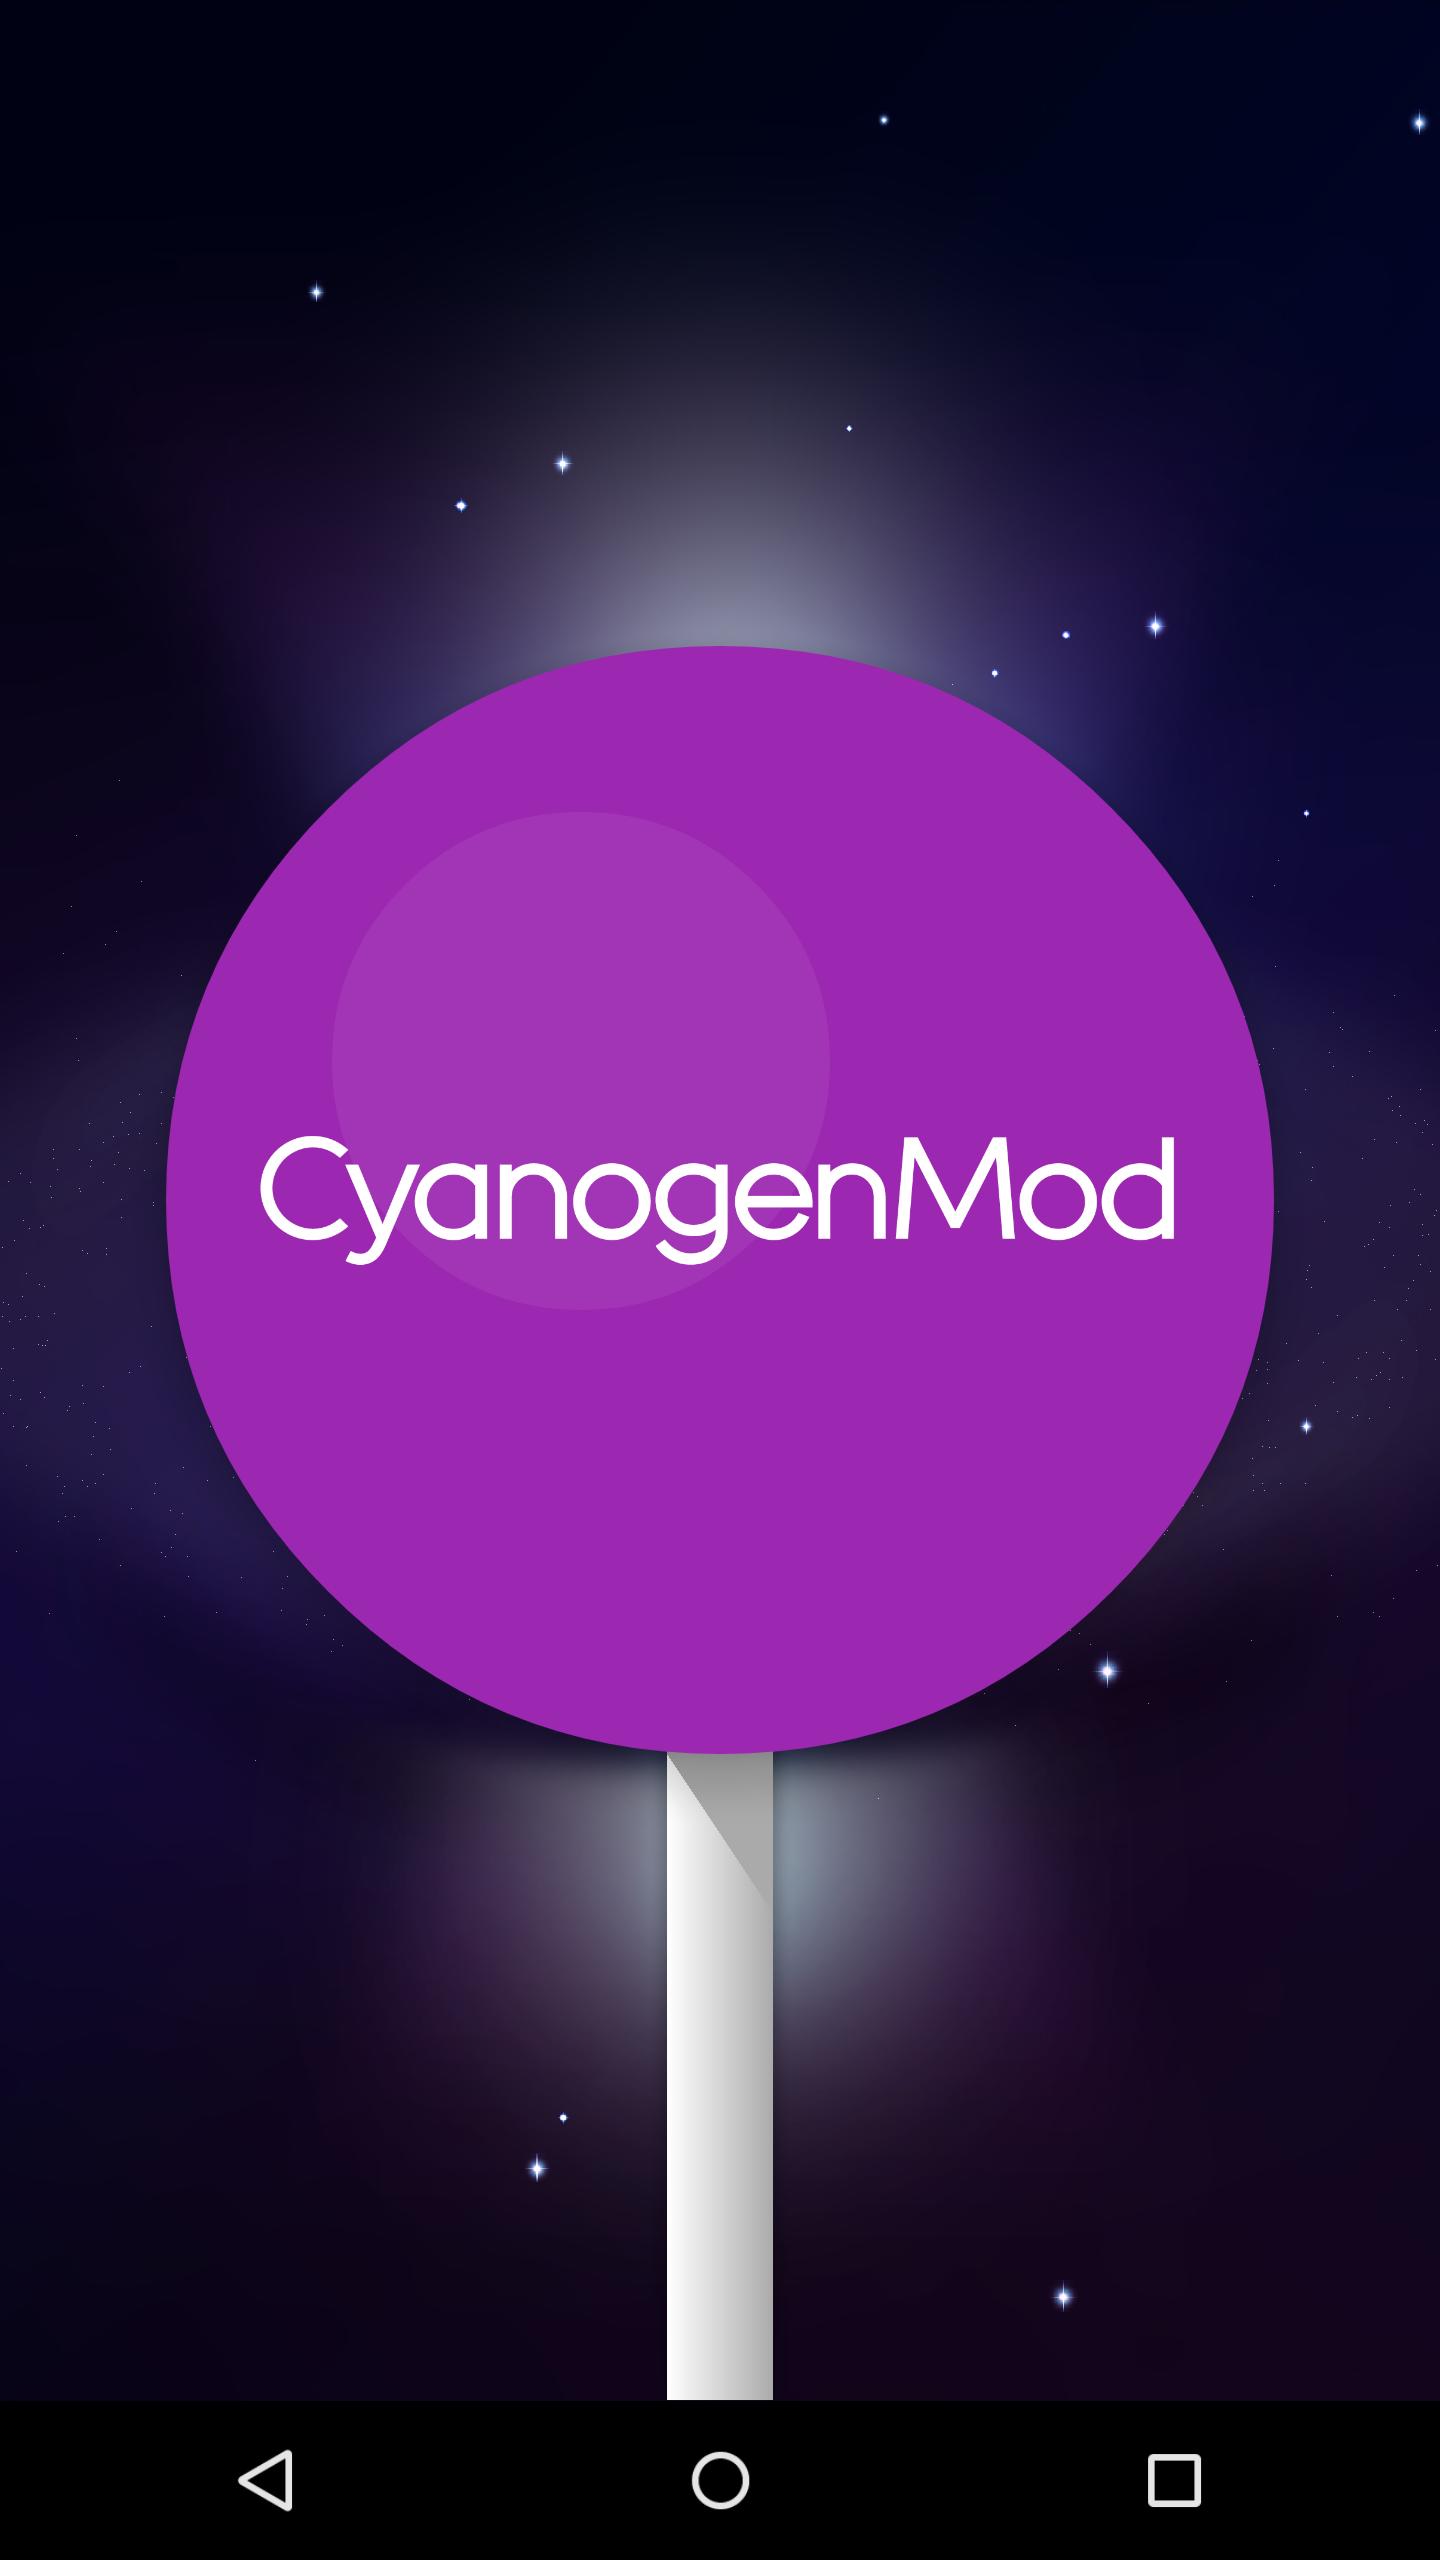 Photo of حصرياً: -تحديث- [روم] [12.1] سيانوجين مود للاس 2 Android Lollipop 5.0.2 GT-I9100